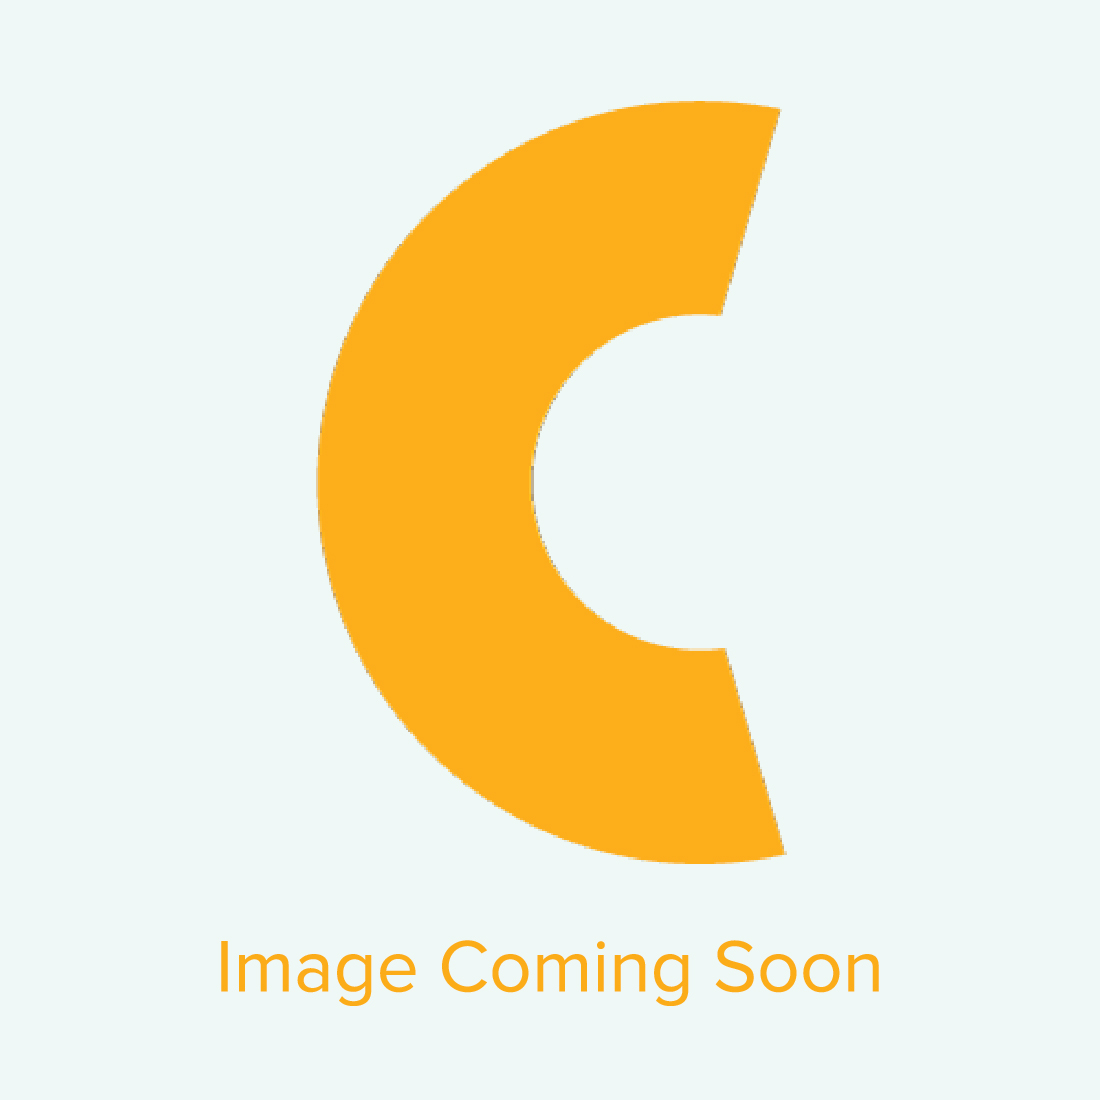 Bella M/C SS10 Heat Fix Rhinestones - 10/bag - CLEARANCE